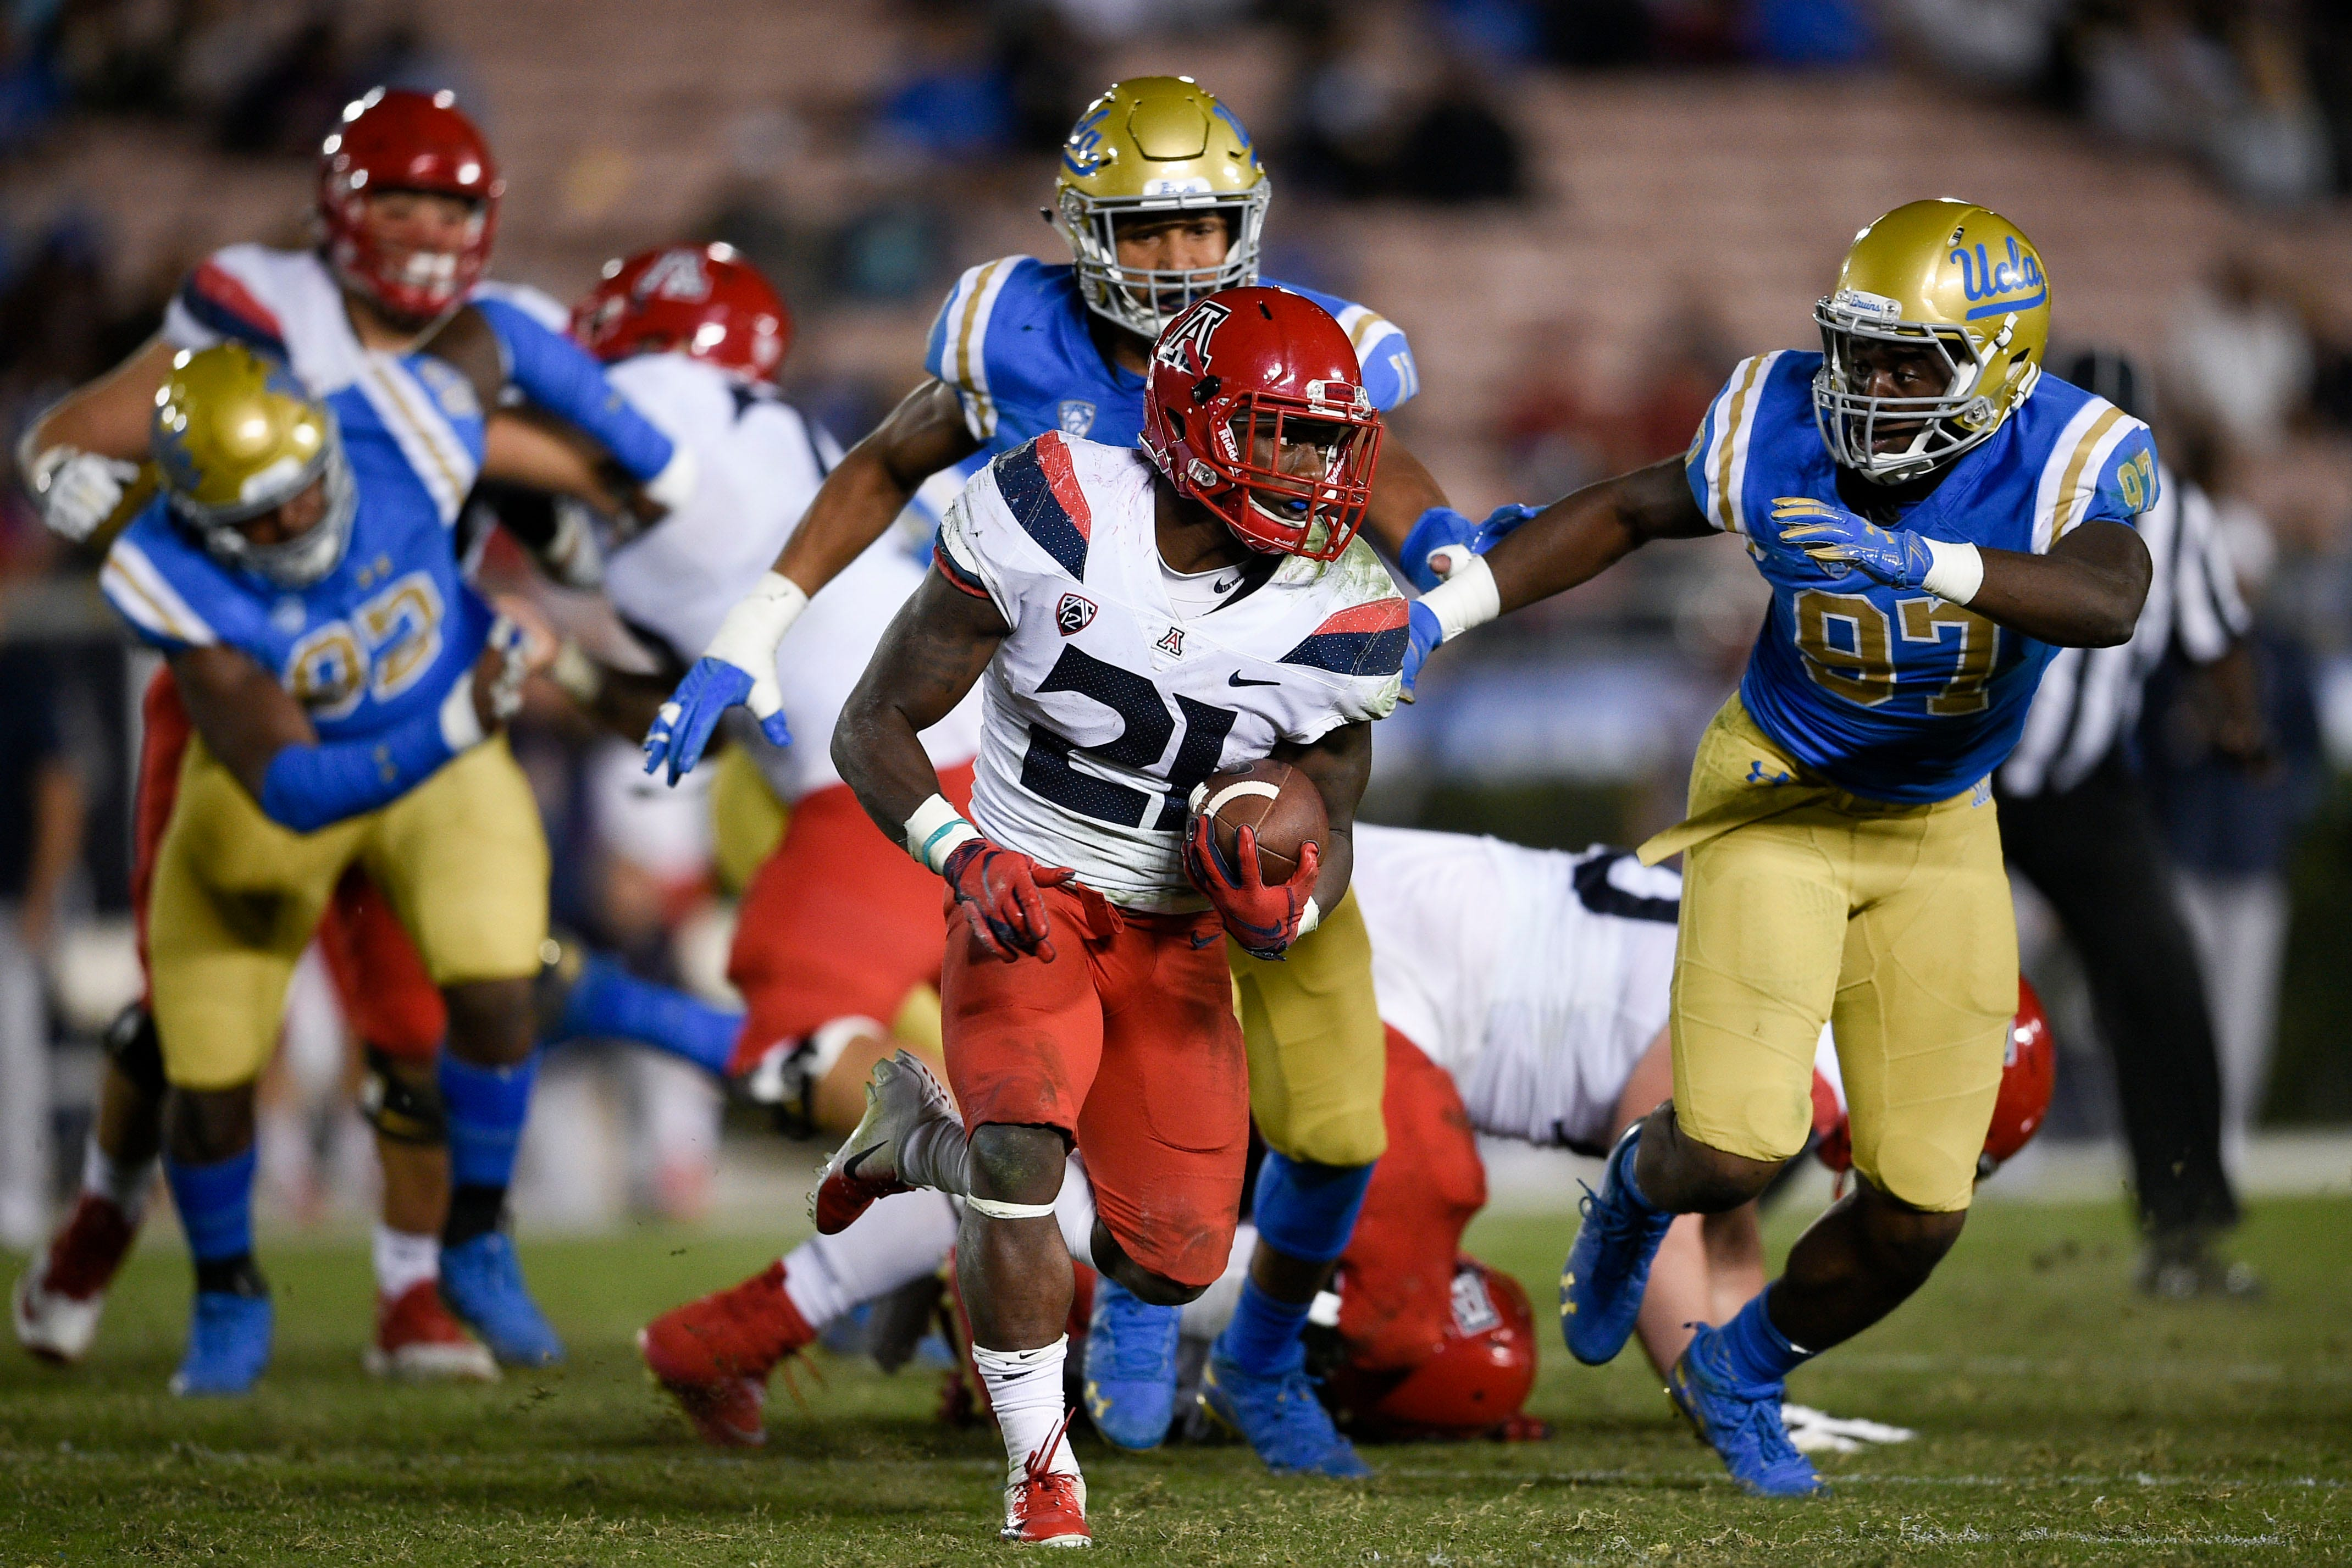 Arizona Wildcats football: Takeaways from loss to UCLA